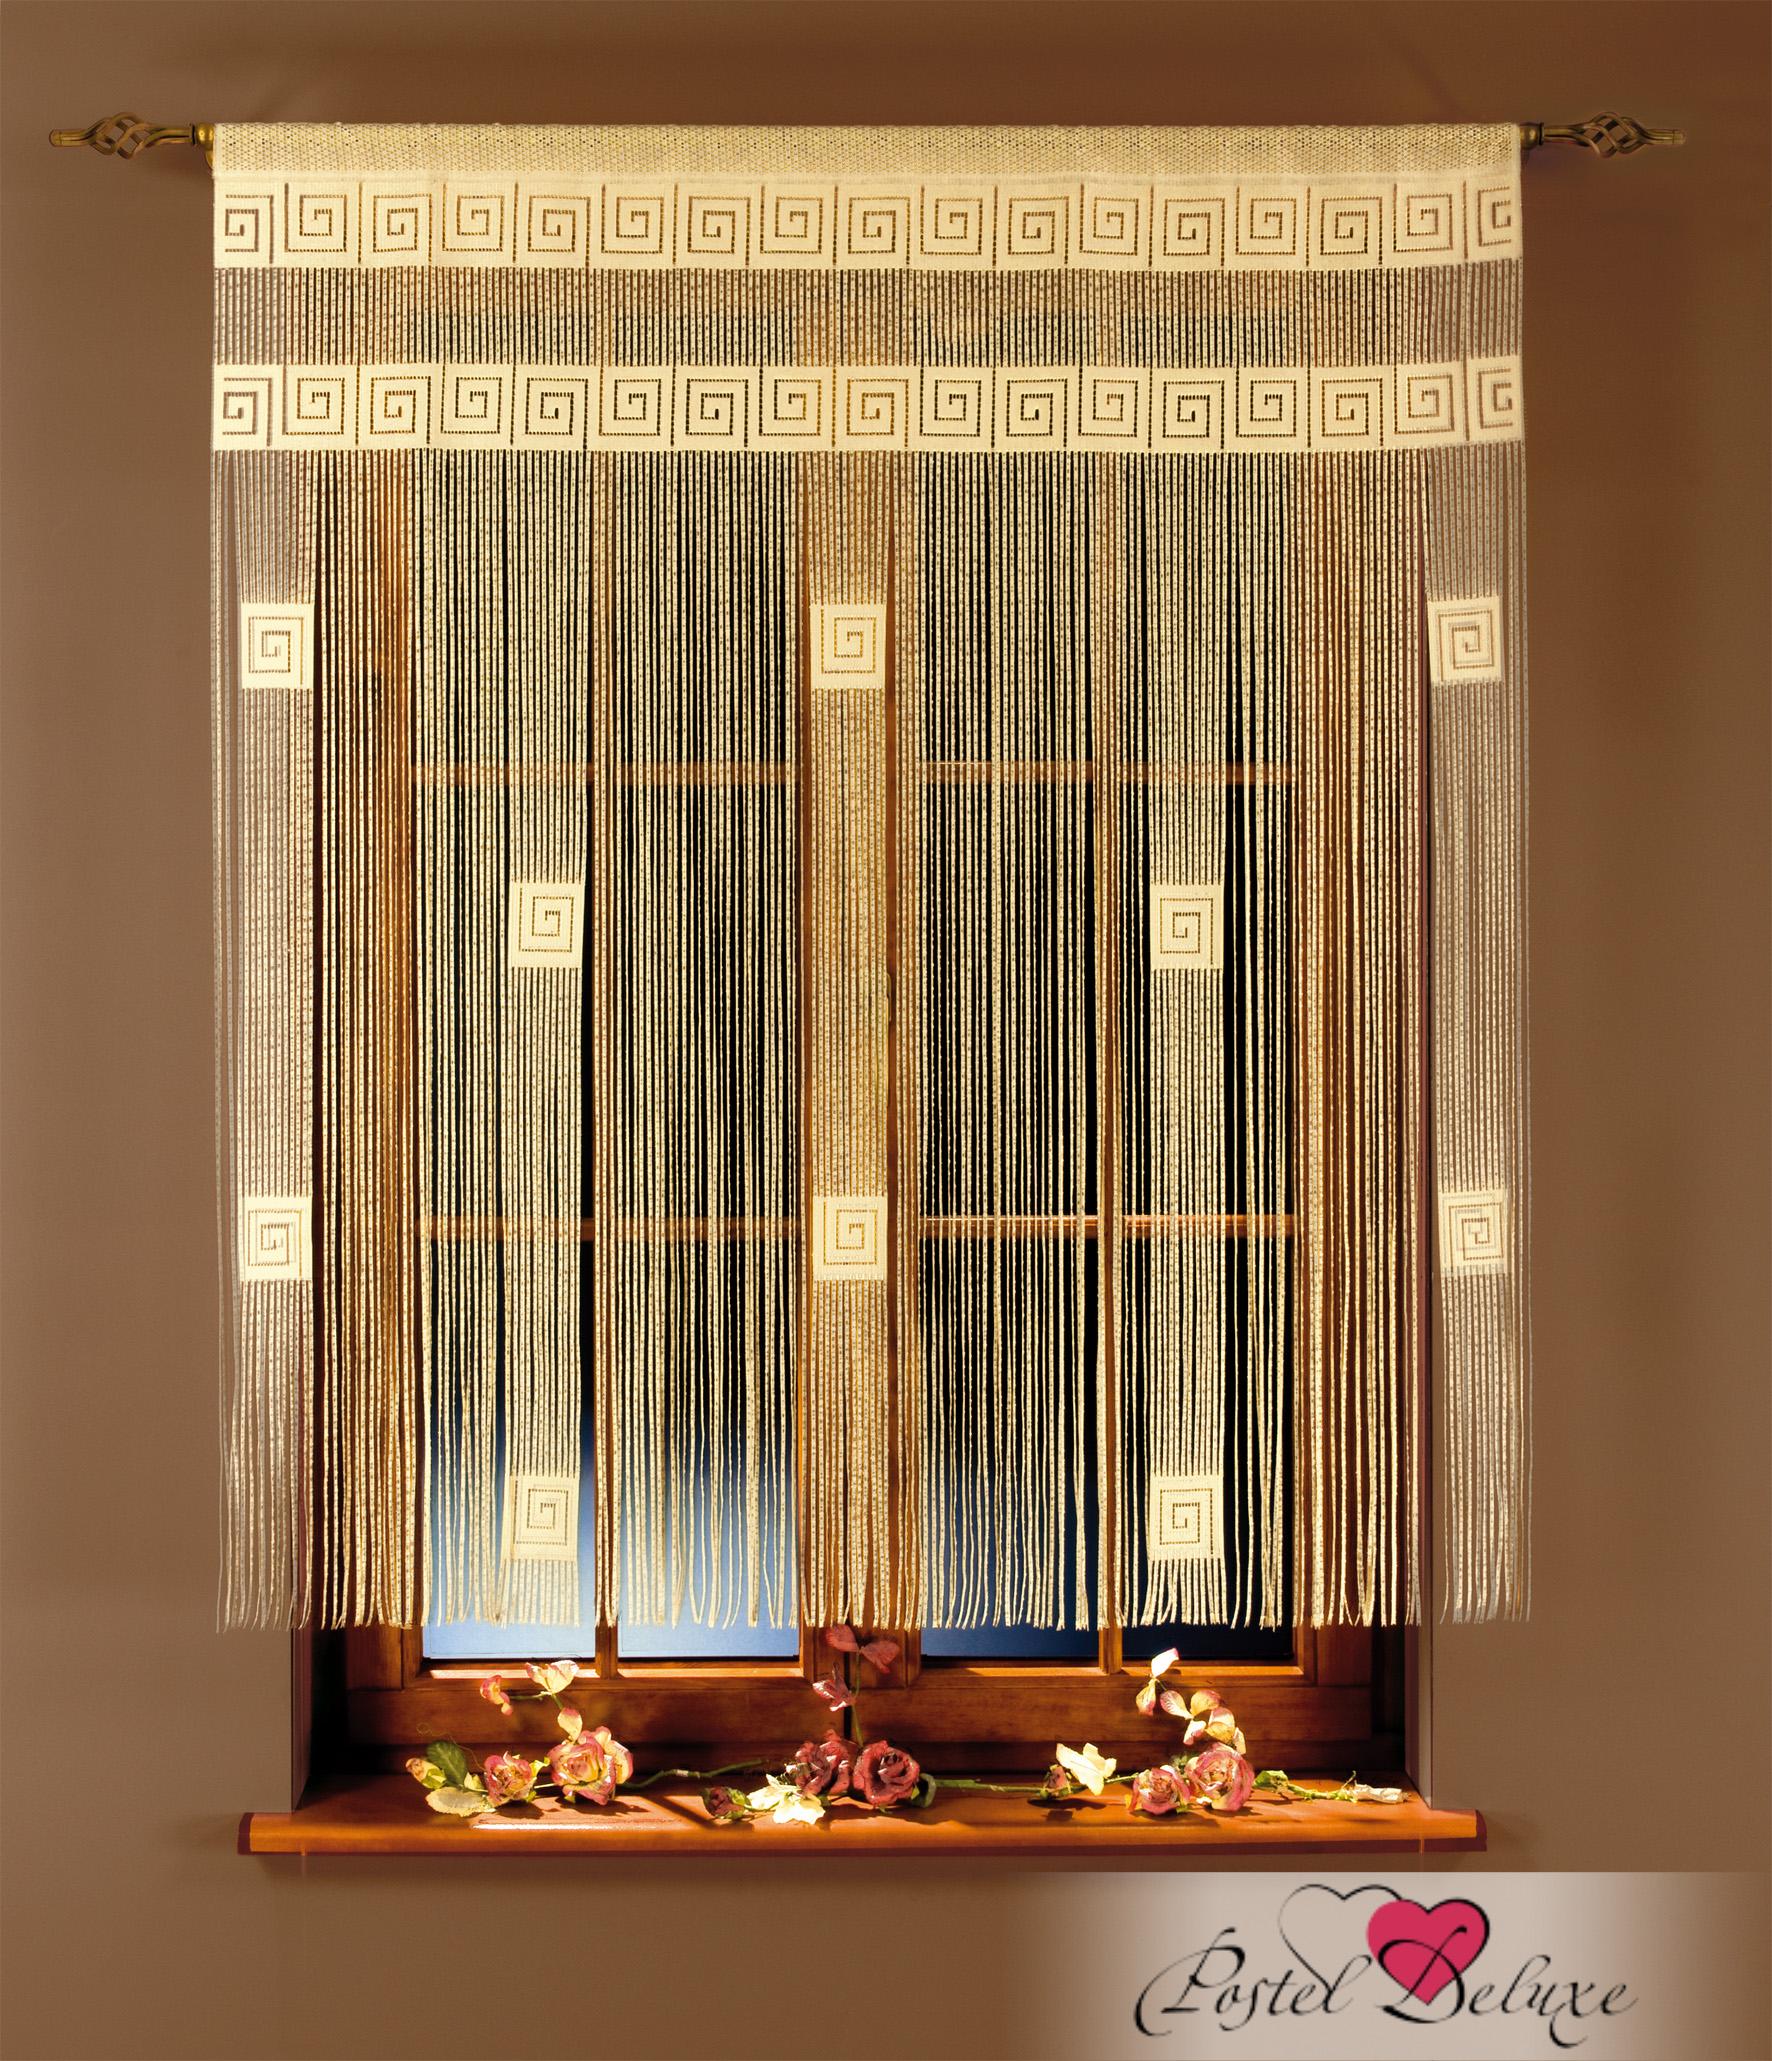 Шторы Wisan Нитяные шторы Katelin Цвет: Кремовый wisan wisan нитяные шторы joelle цвет кремовый бежевый